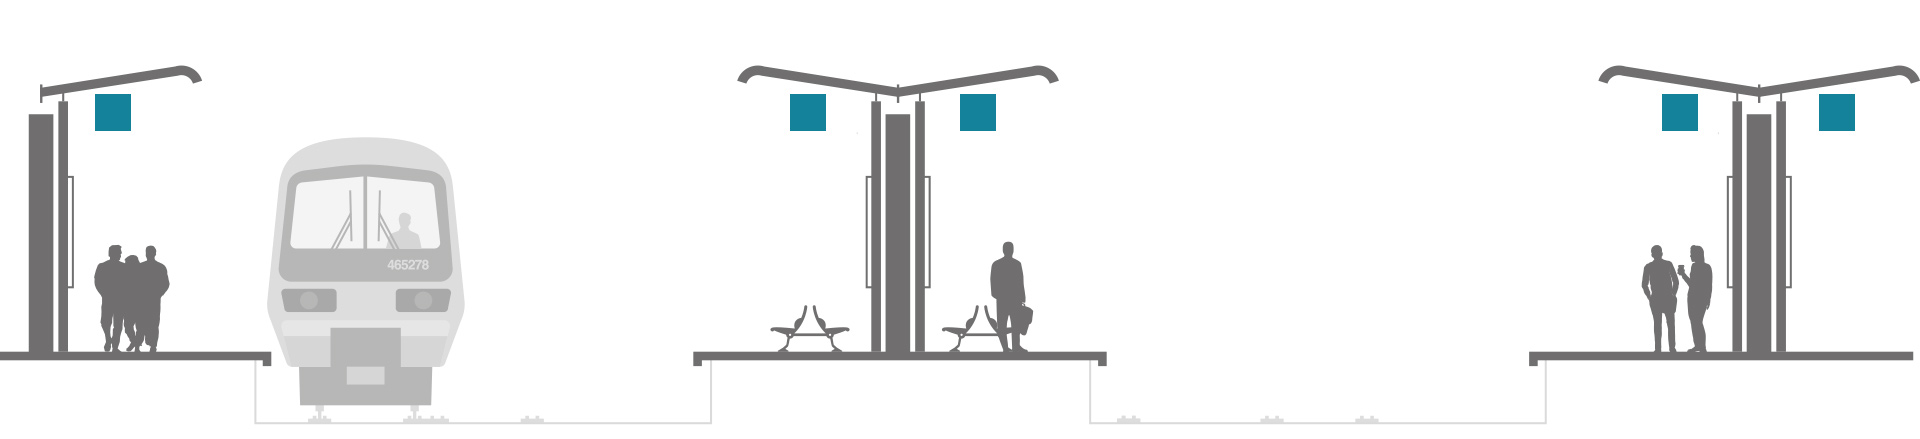 Transportapplications_covered_platform